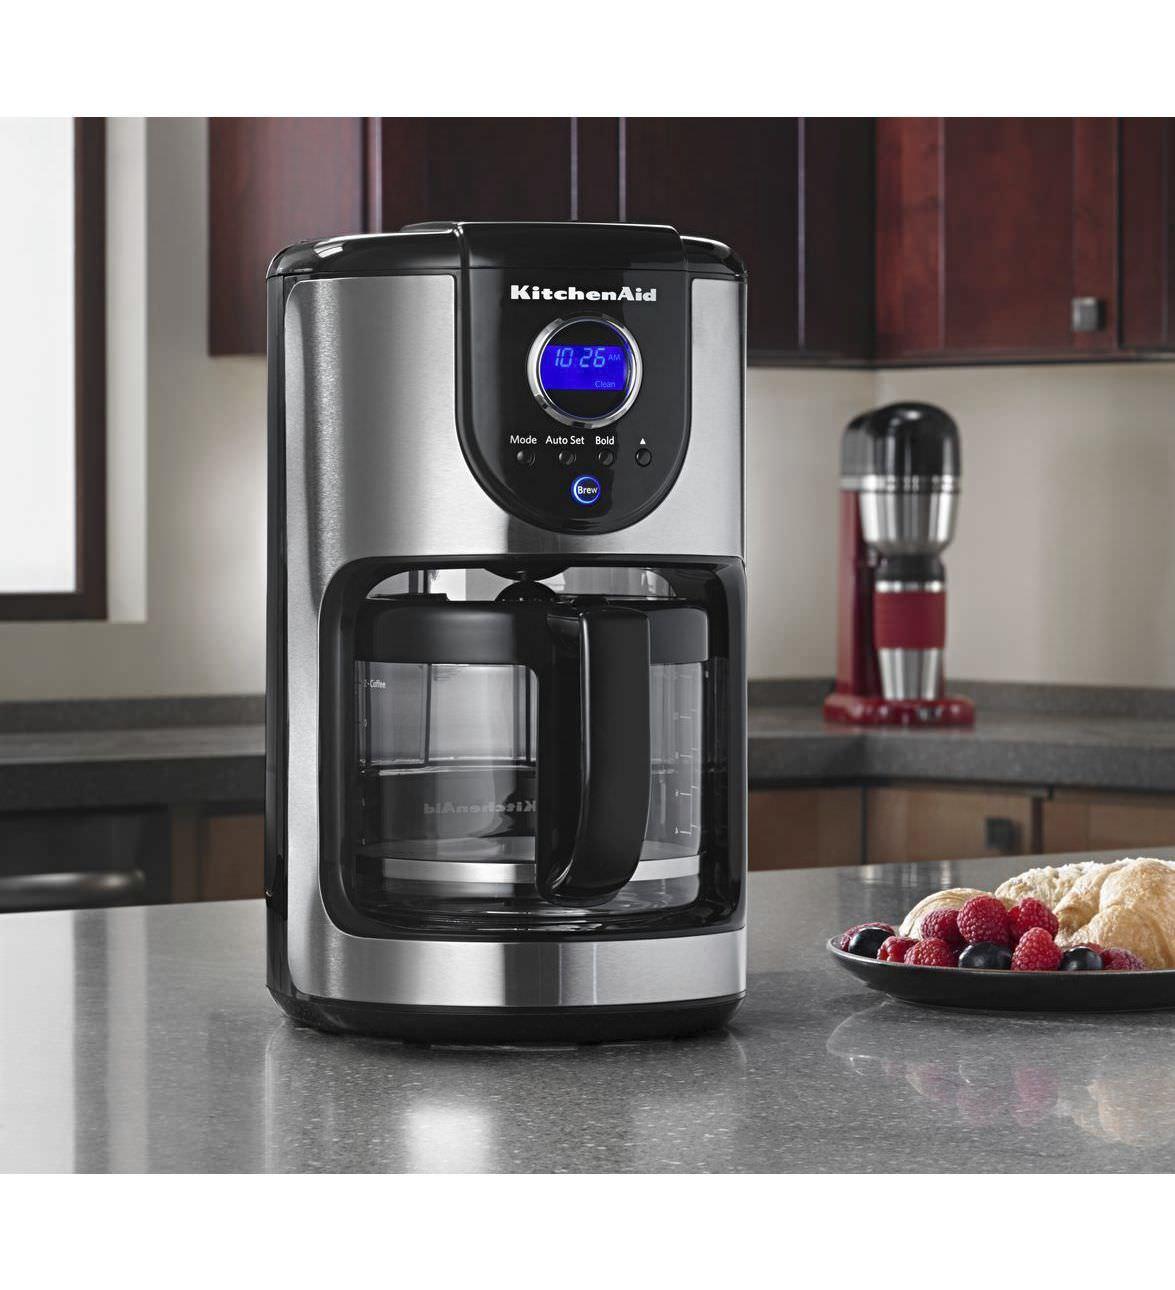 Filter Coffee Machine Manual Kcm111ob Kitchenaid Videos